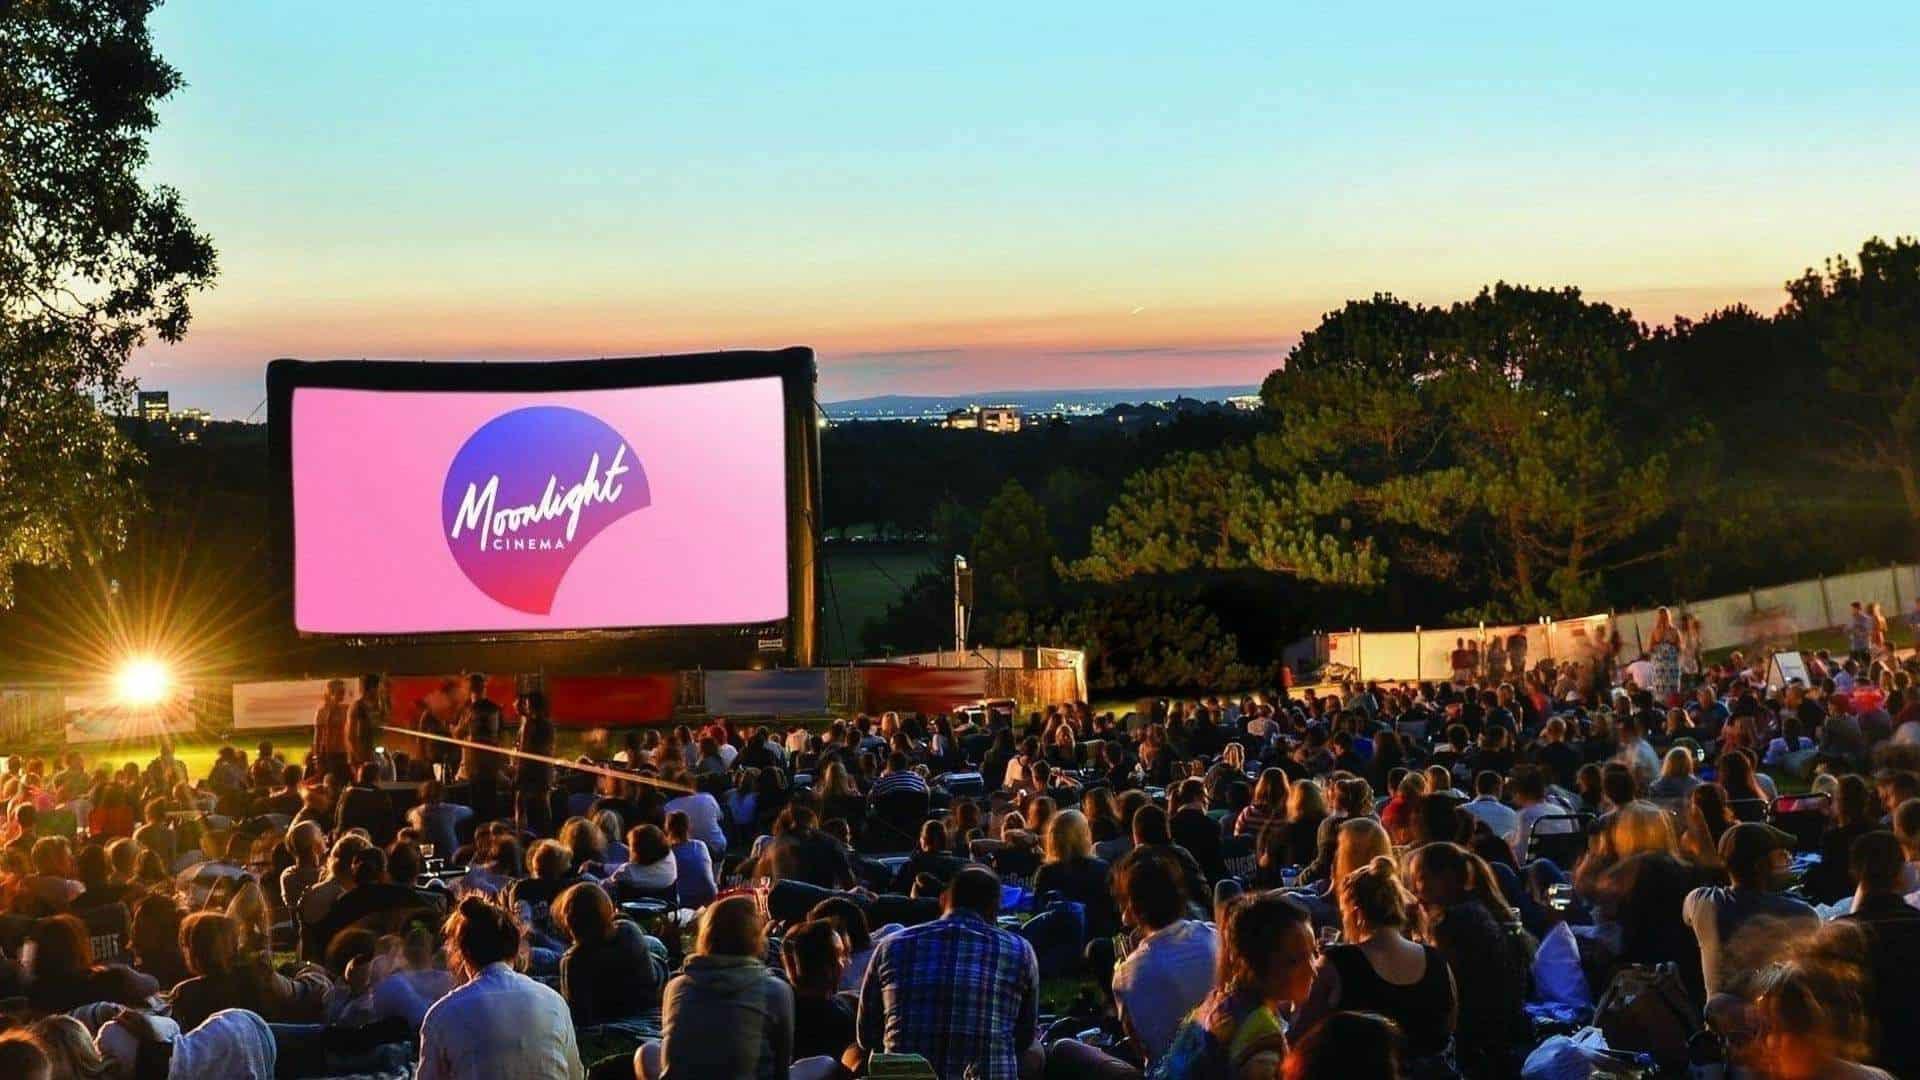 Enjoy movies under the stars at the Moonlight Cinema